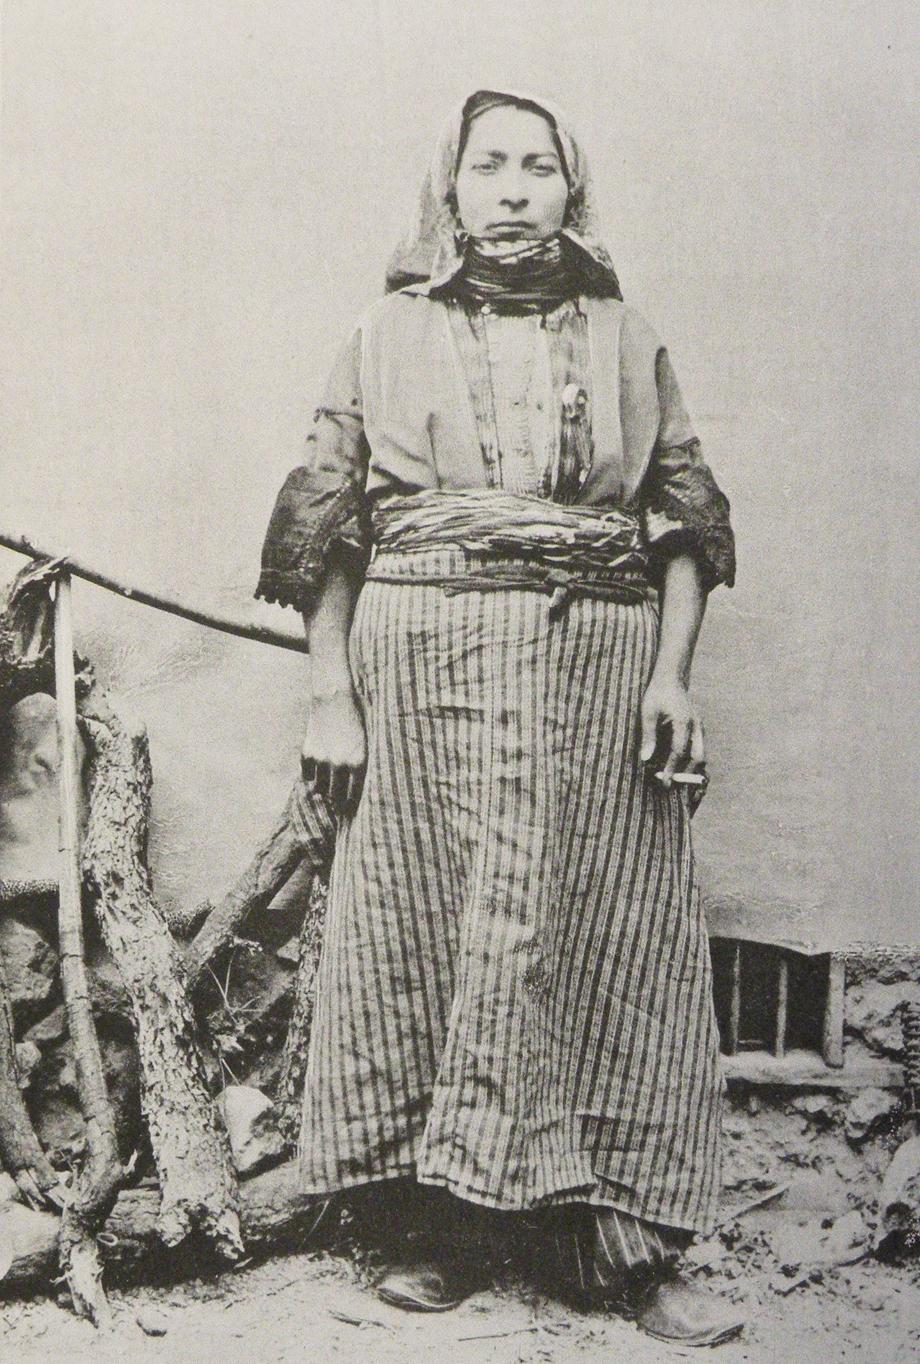 An Armenian woman from Zeytun (Source: Mark Sykes, Dar-ul-Islam, London, 1904)